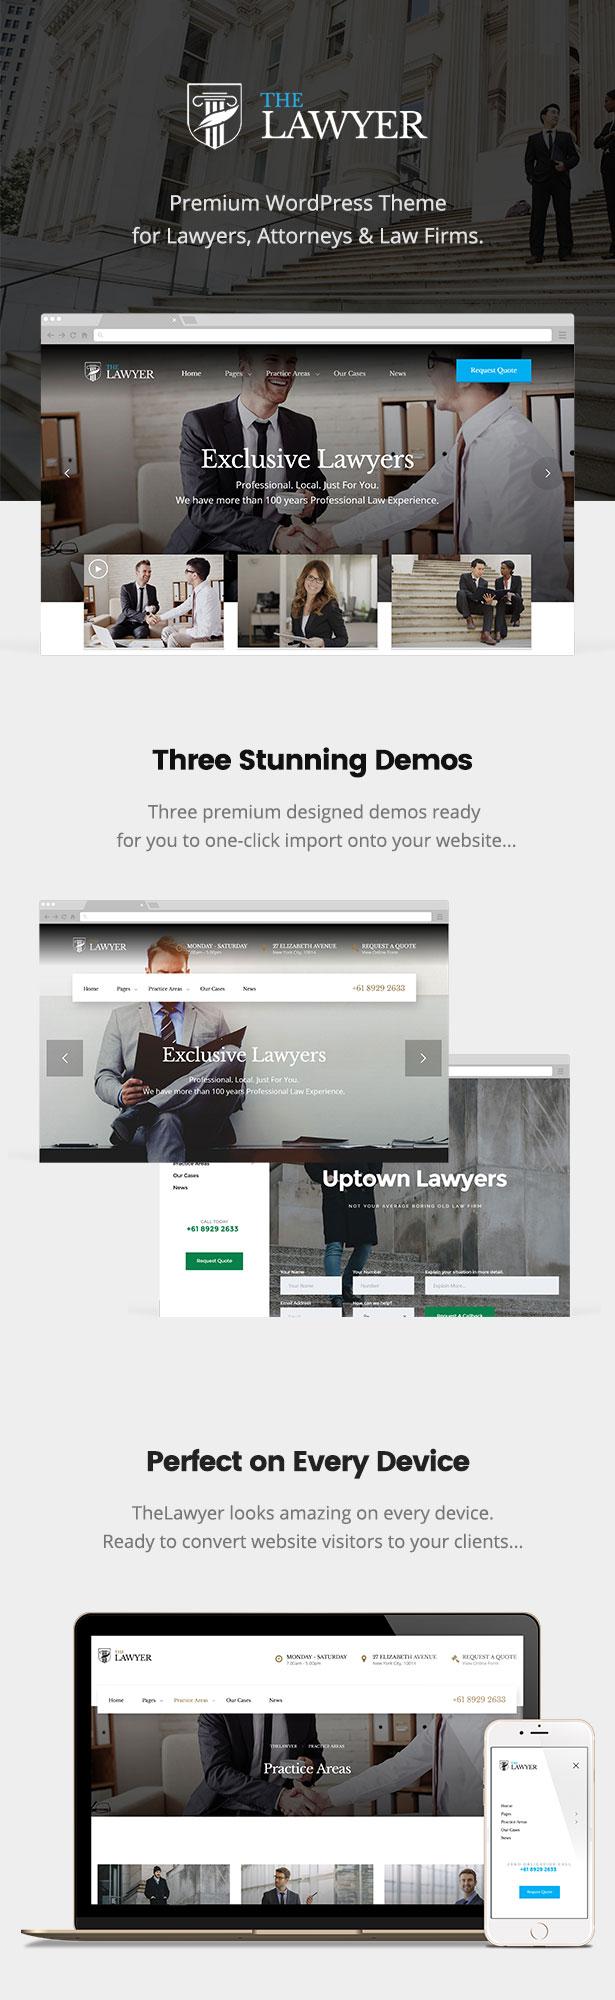 TheLawyer – Rechtsanwalt & Rechtsanwalt WordPress Theme - 1